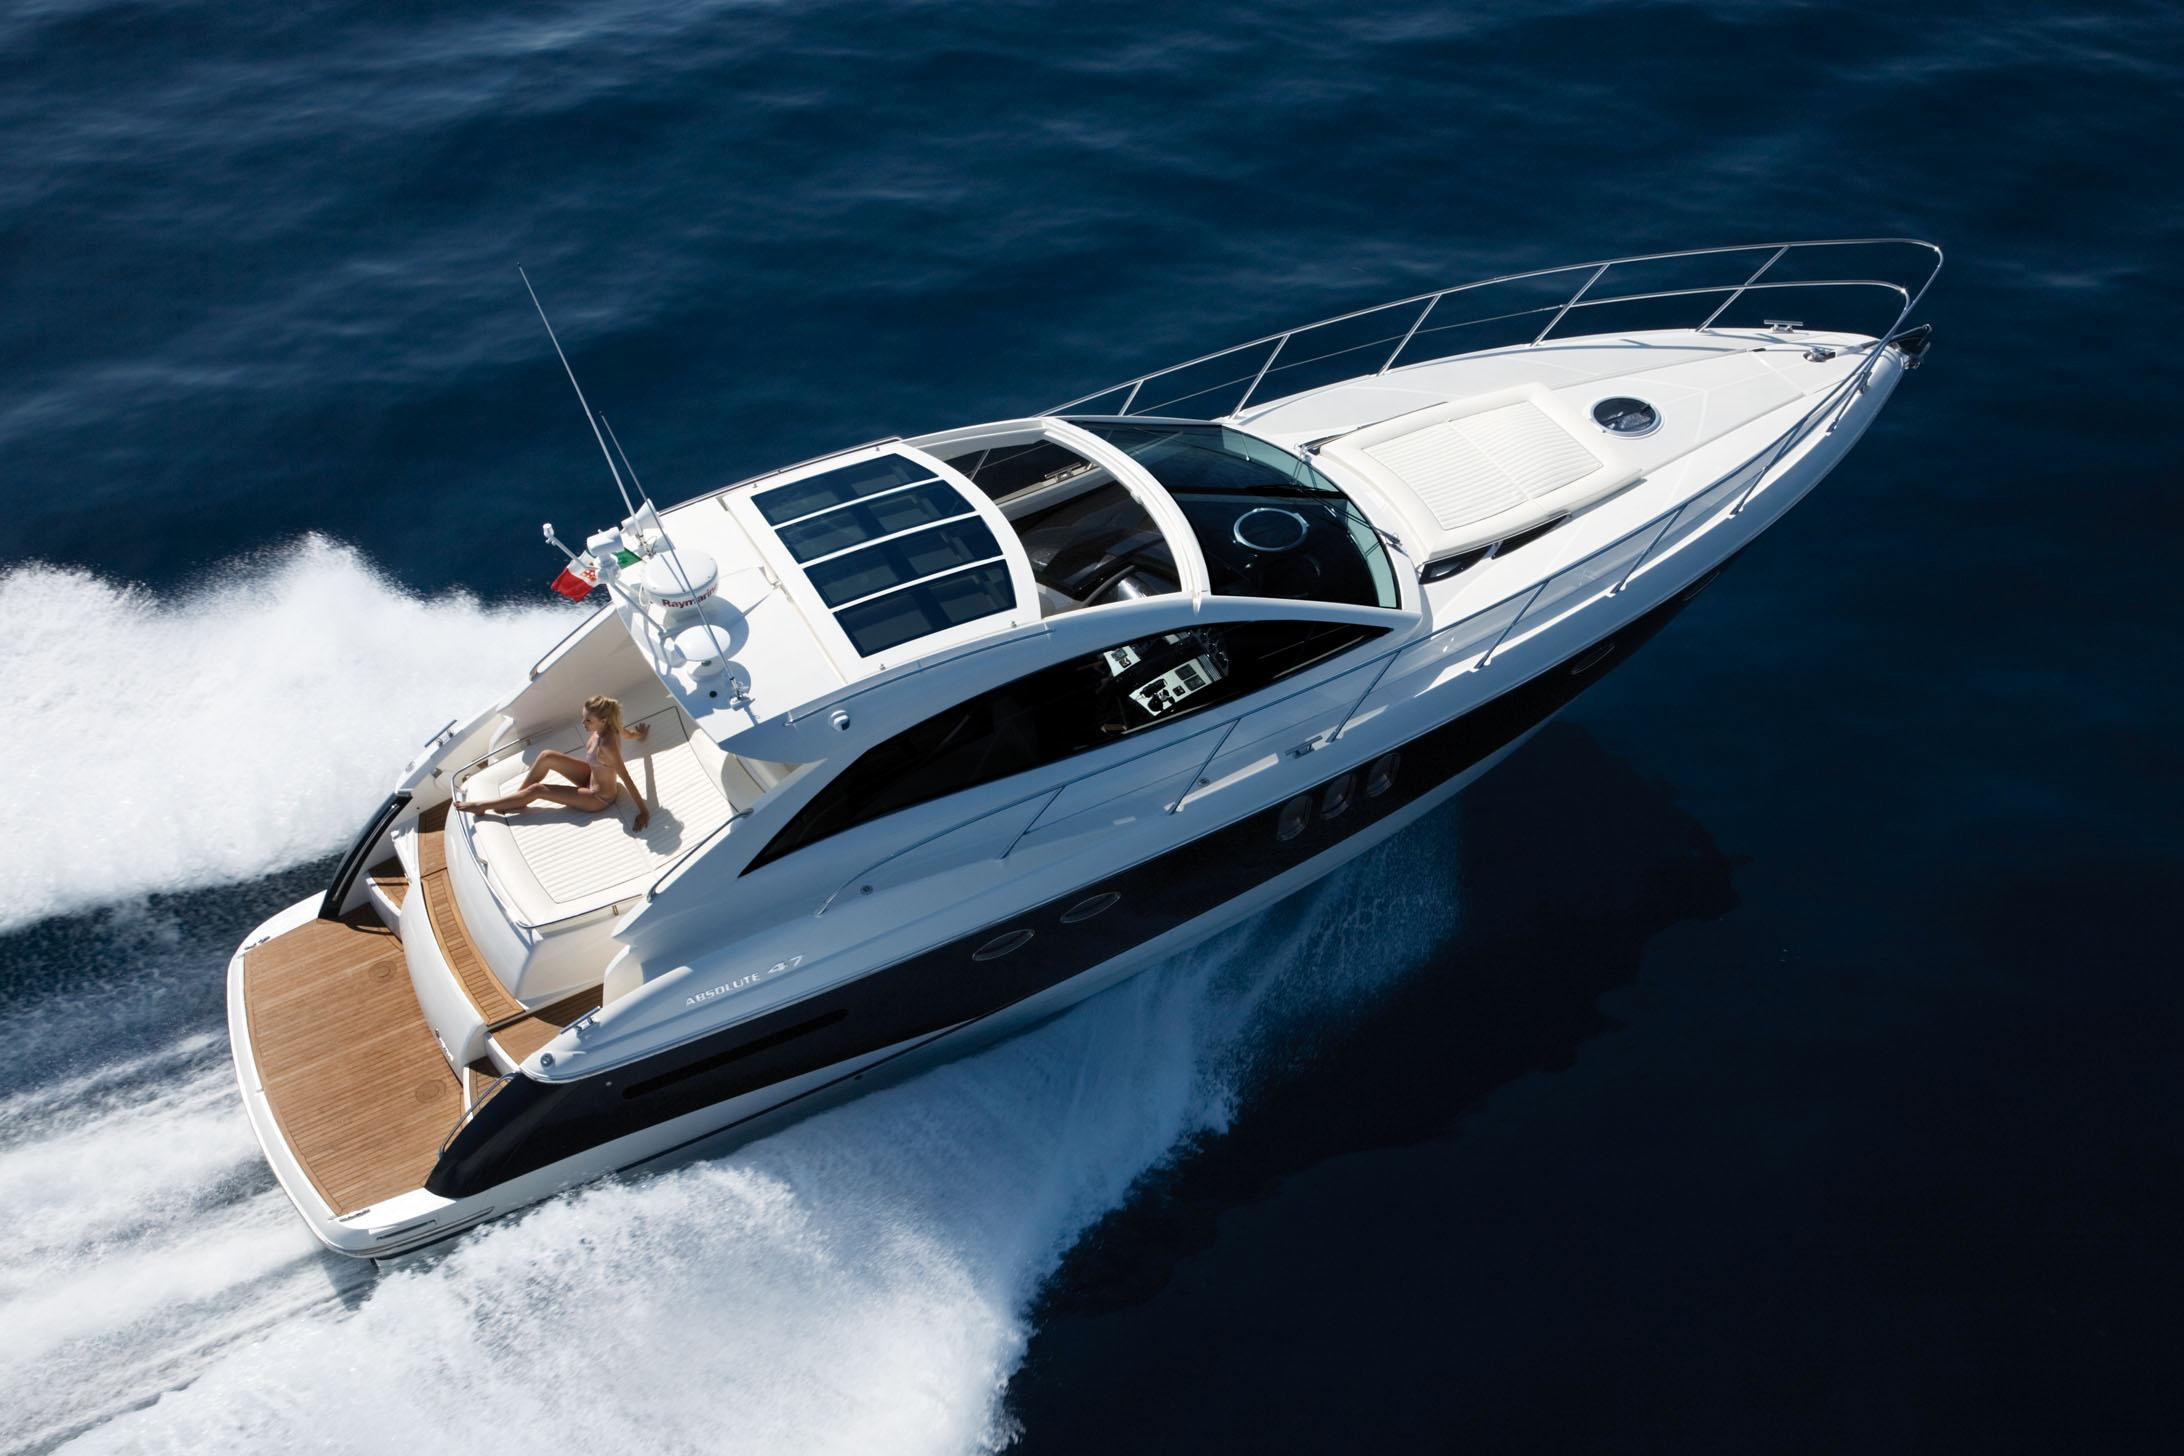 2009 Absolute 47 HT Power Boat For Sale Wwwyachtworldcom